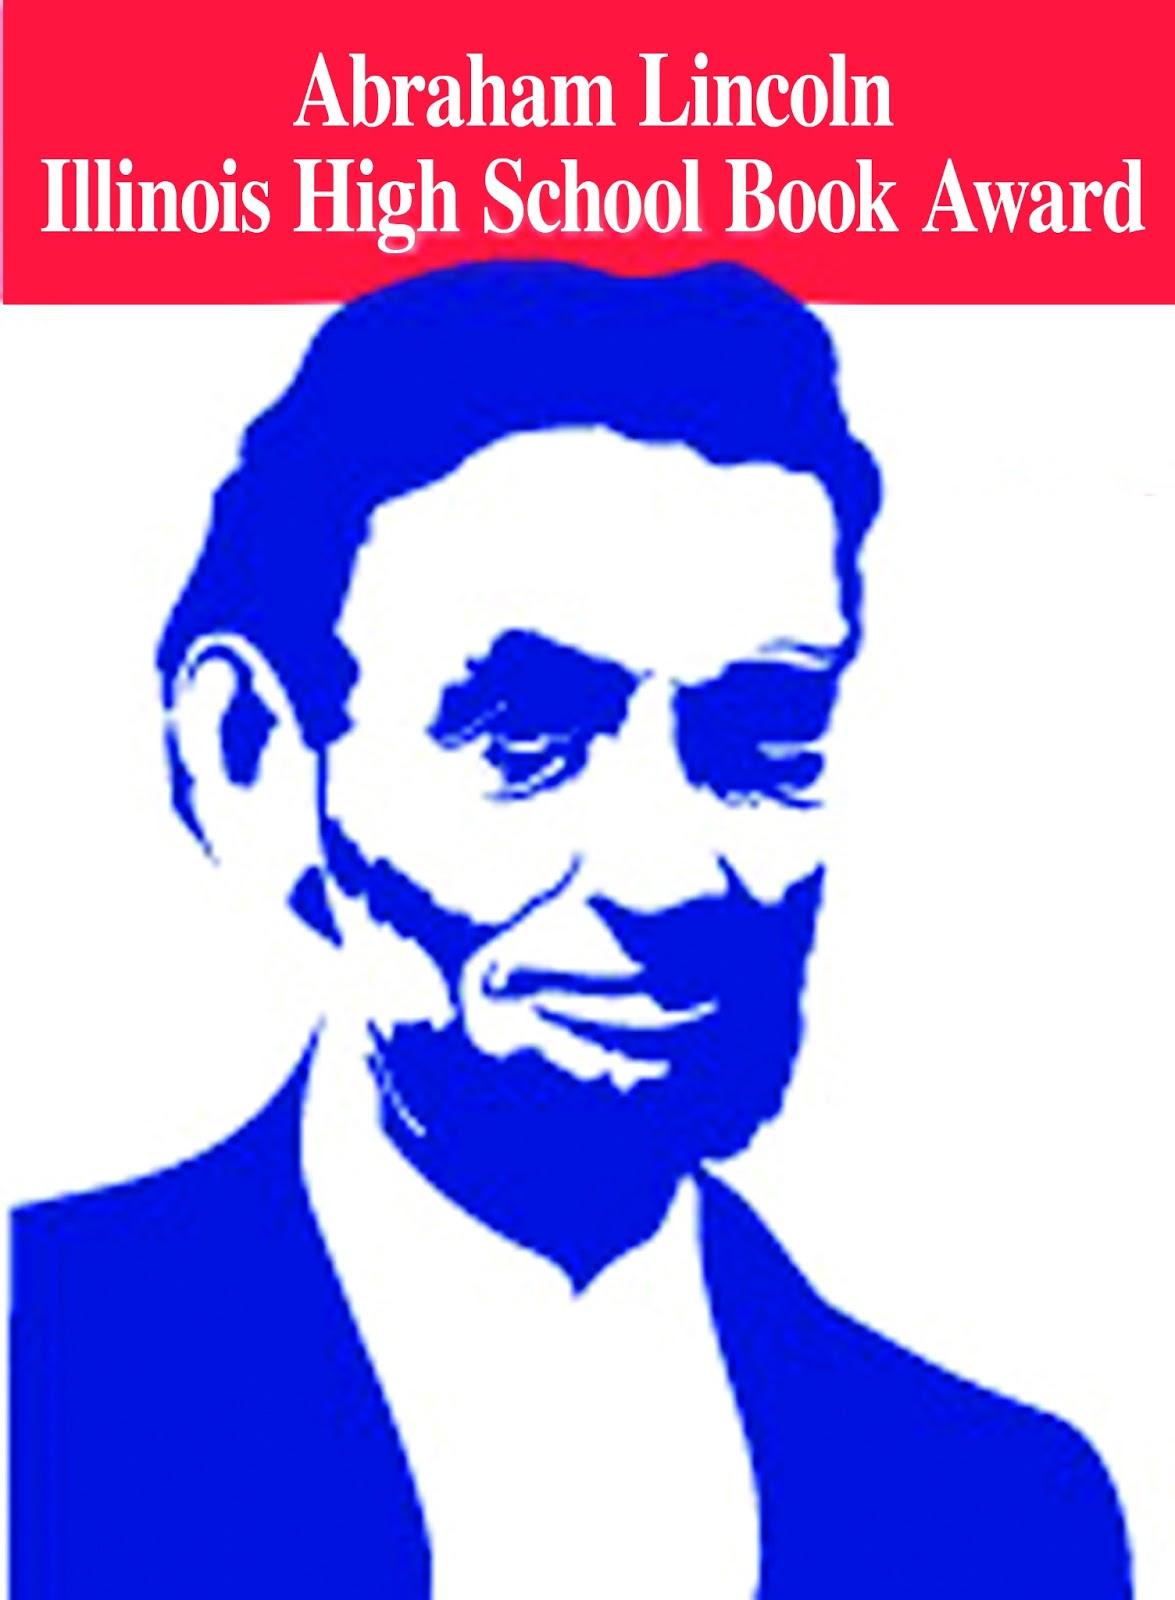 Abraham Lincoln Illinois High School Book Award